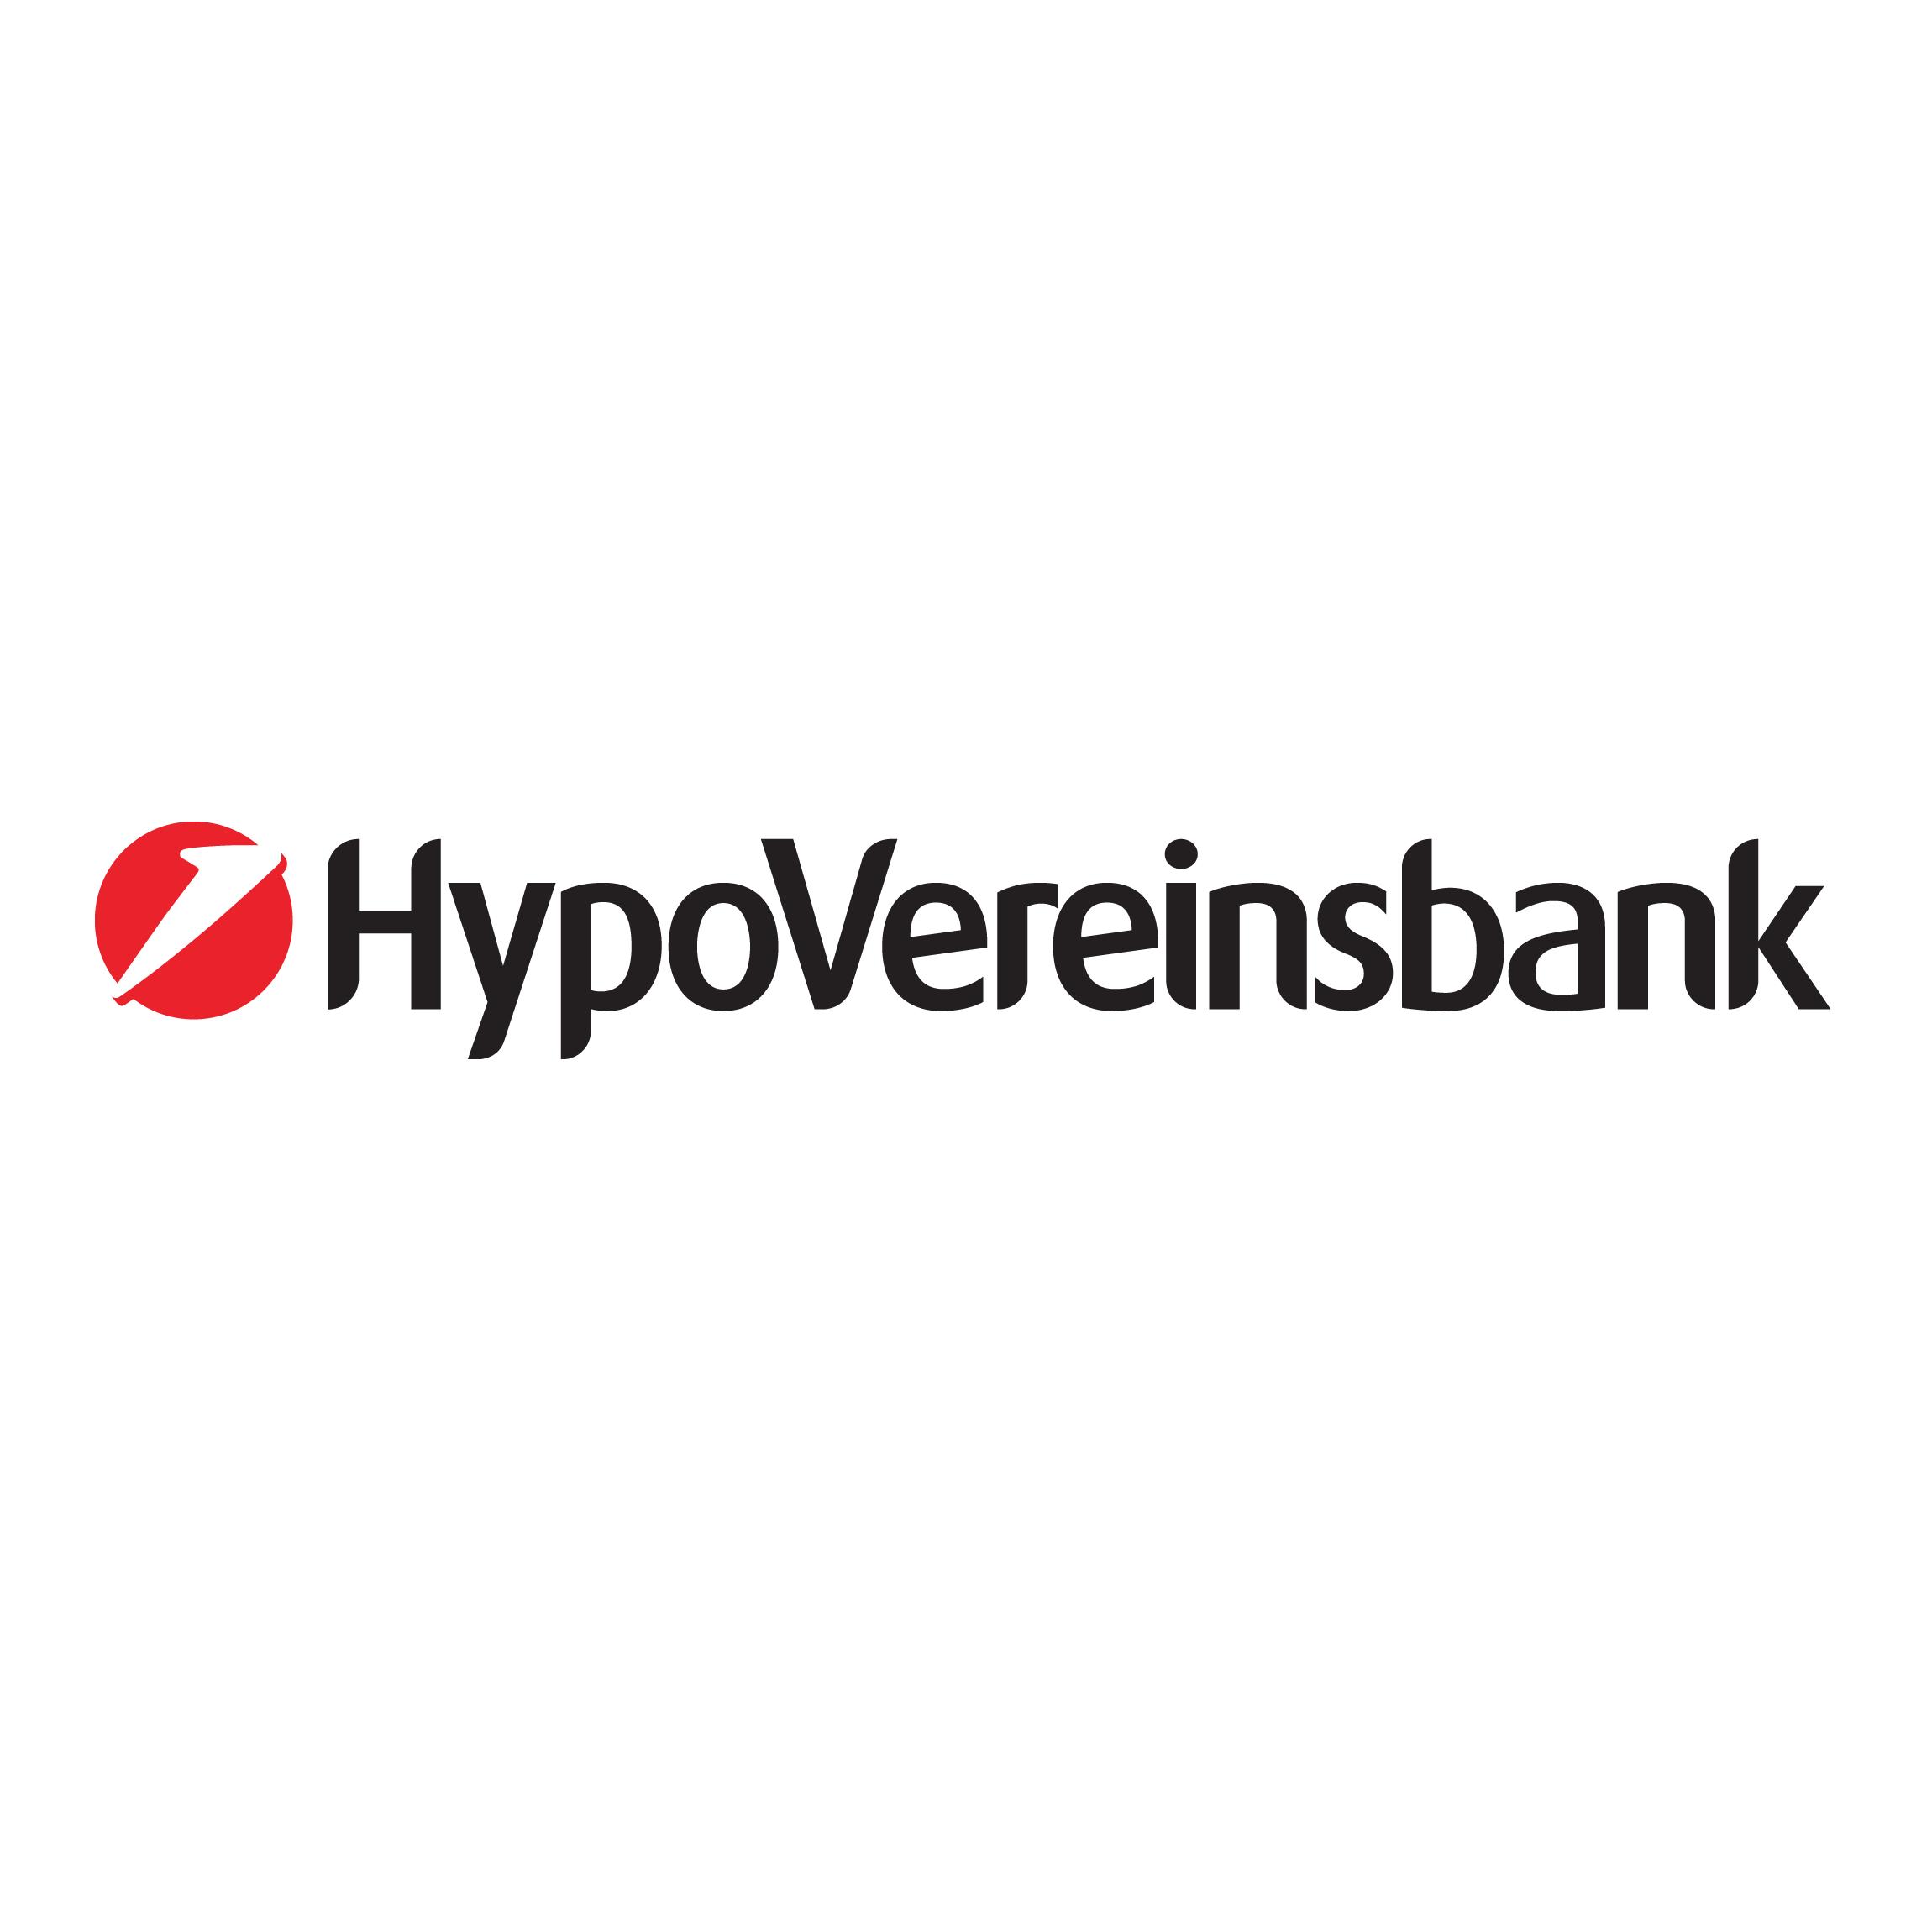 HypoVereinsbank Private Banking Frankfurt am Main